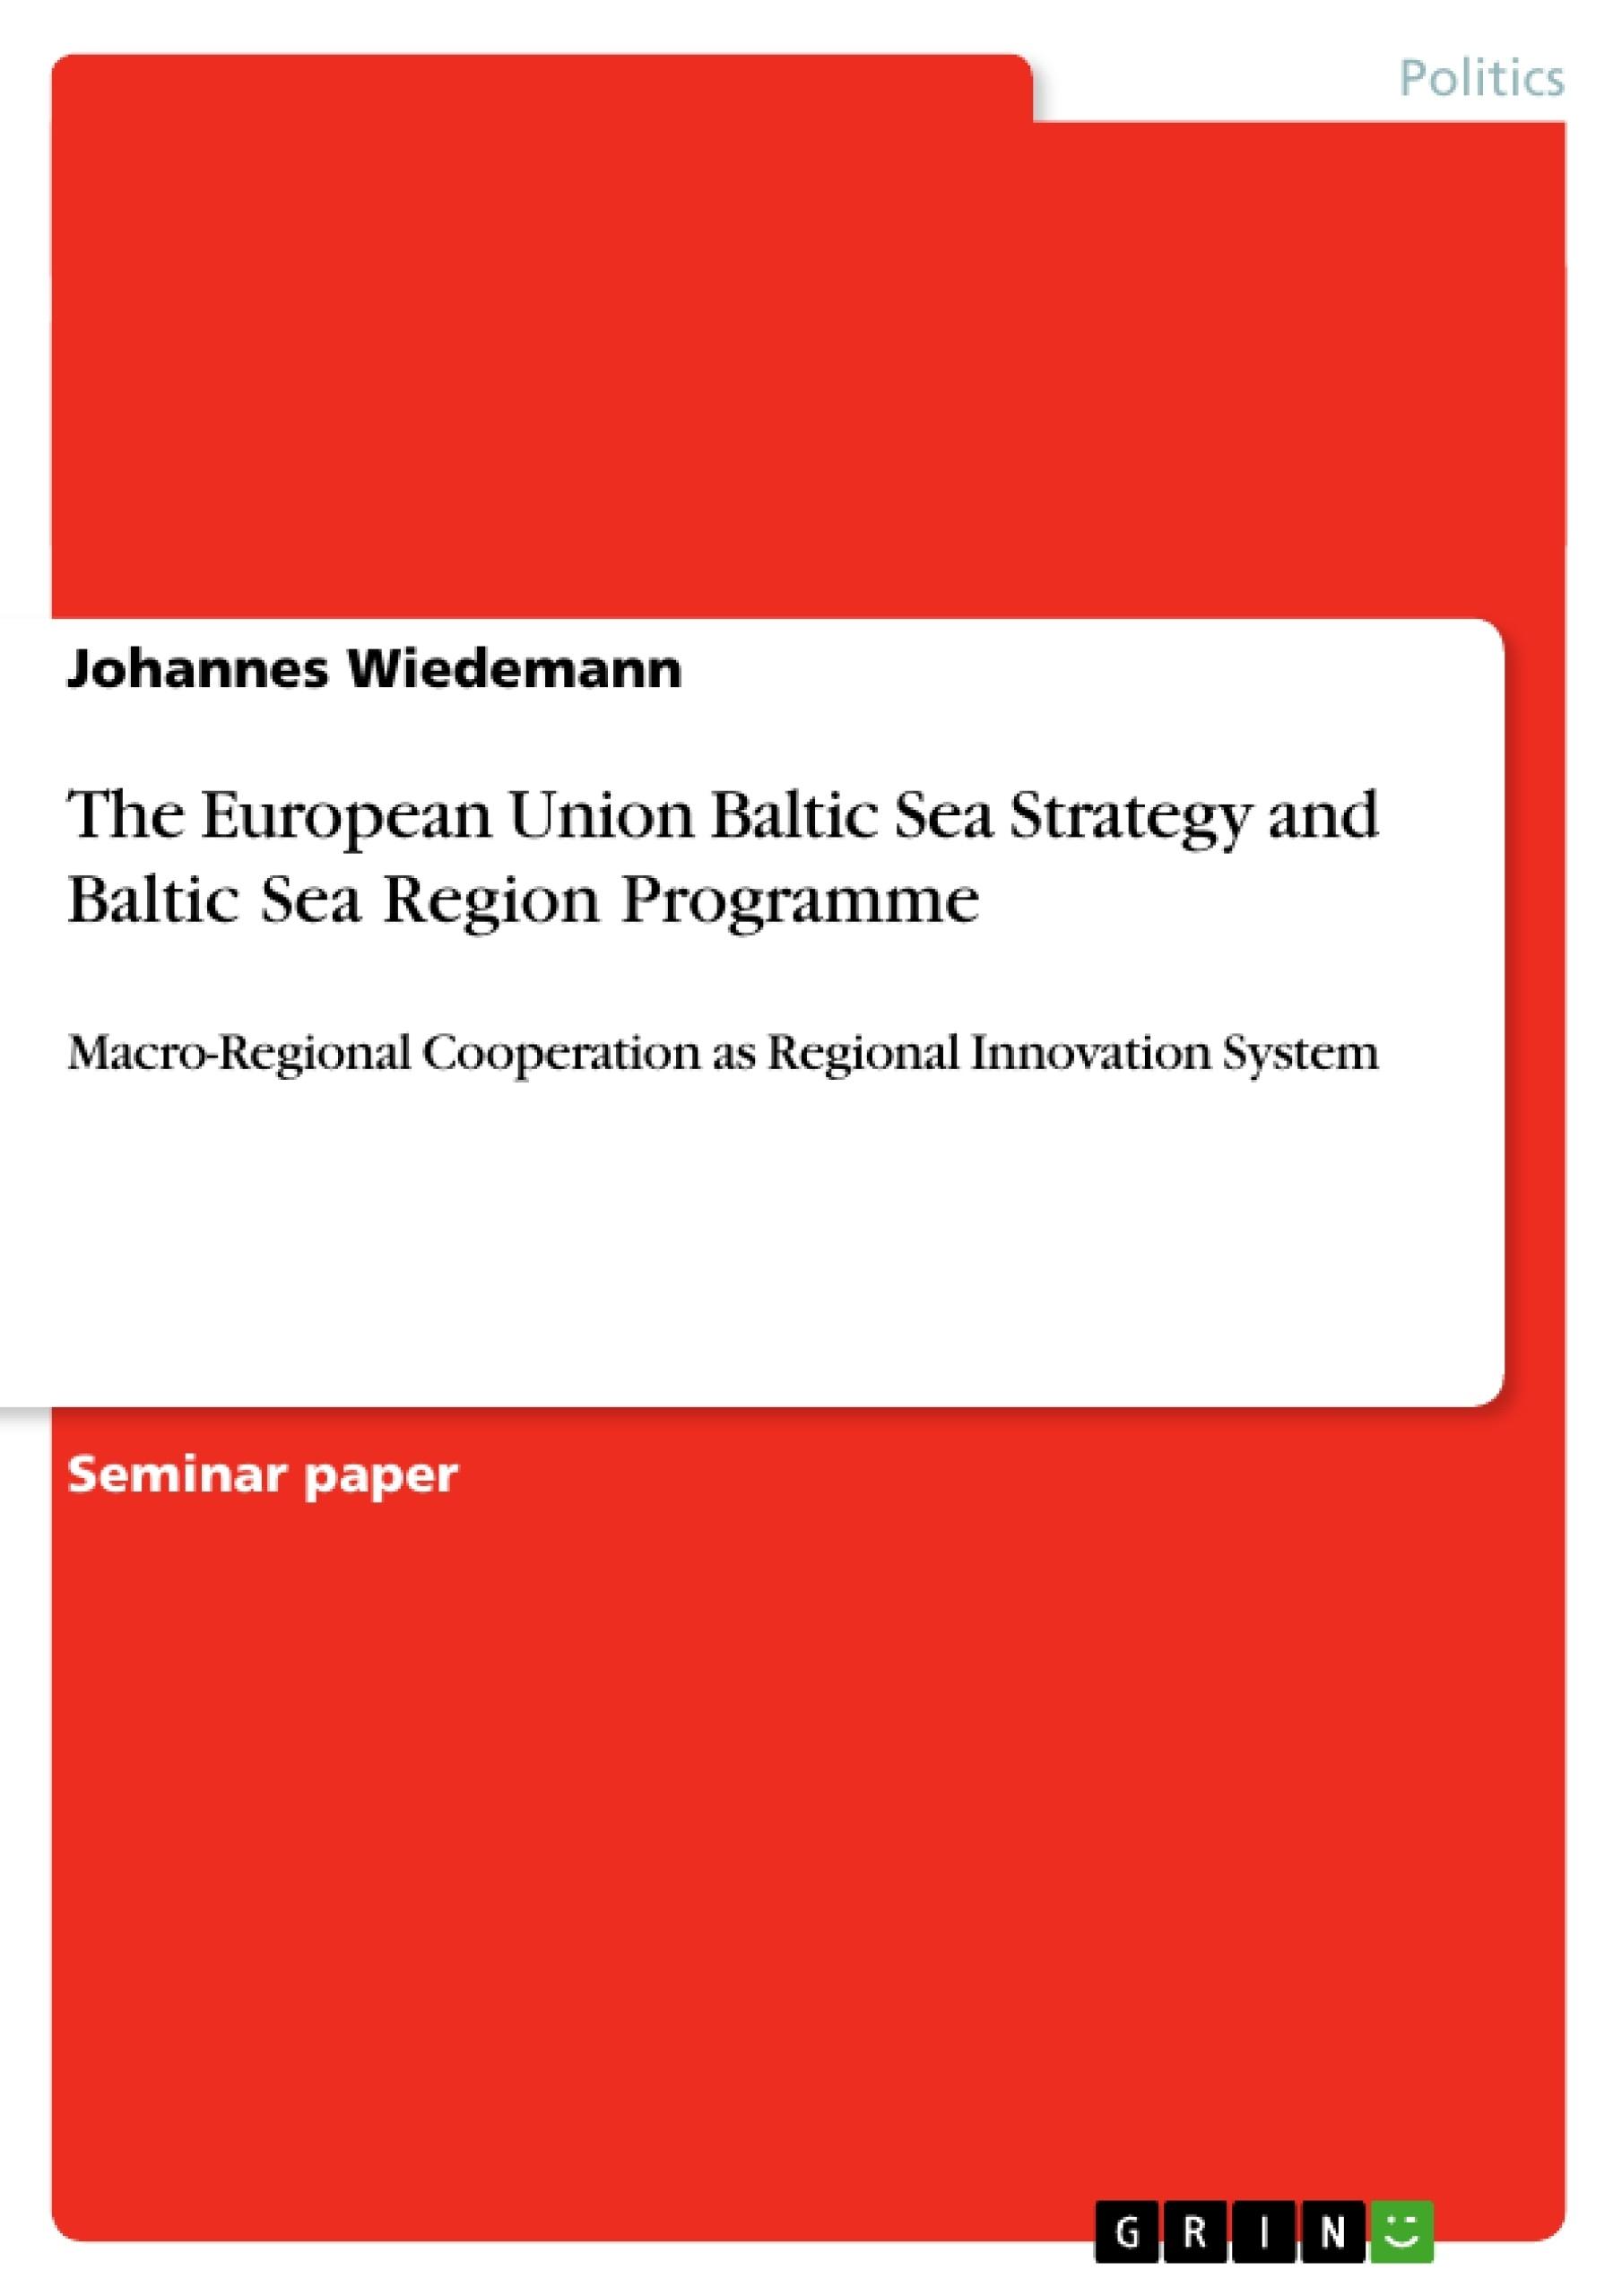 Title: The European Union Baltic Sea Strategy and Baltic Sea Region Programme